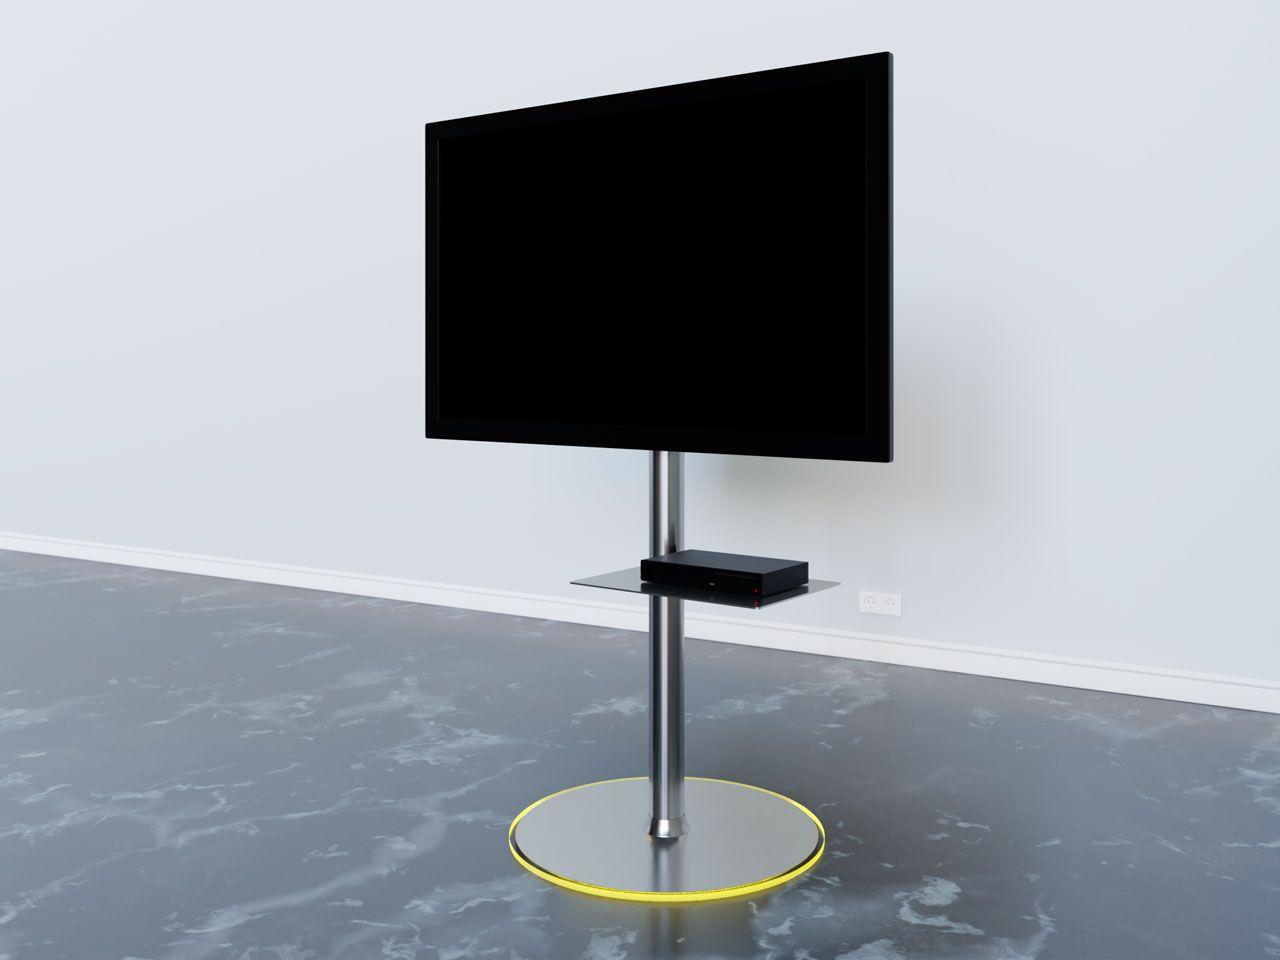 Tv Stander Mit Rgb Led Beleuchtung Im Standfuss Led Beleuchtung Rgb Led Beleuchtung